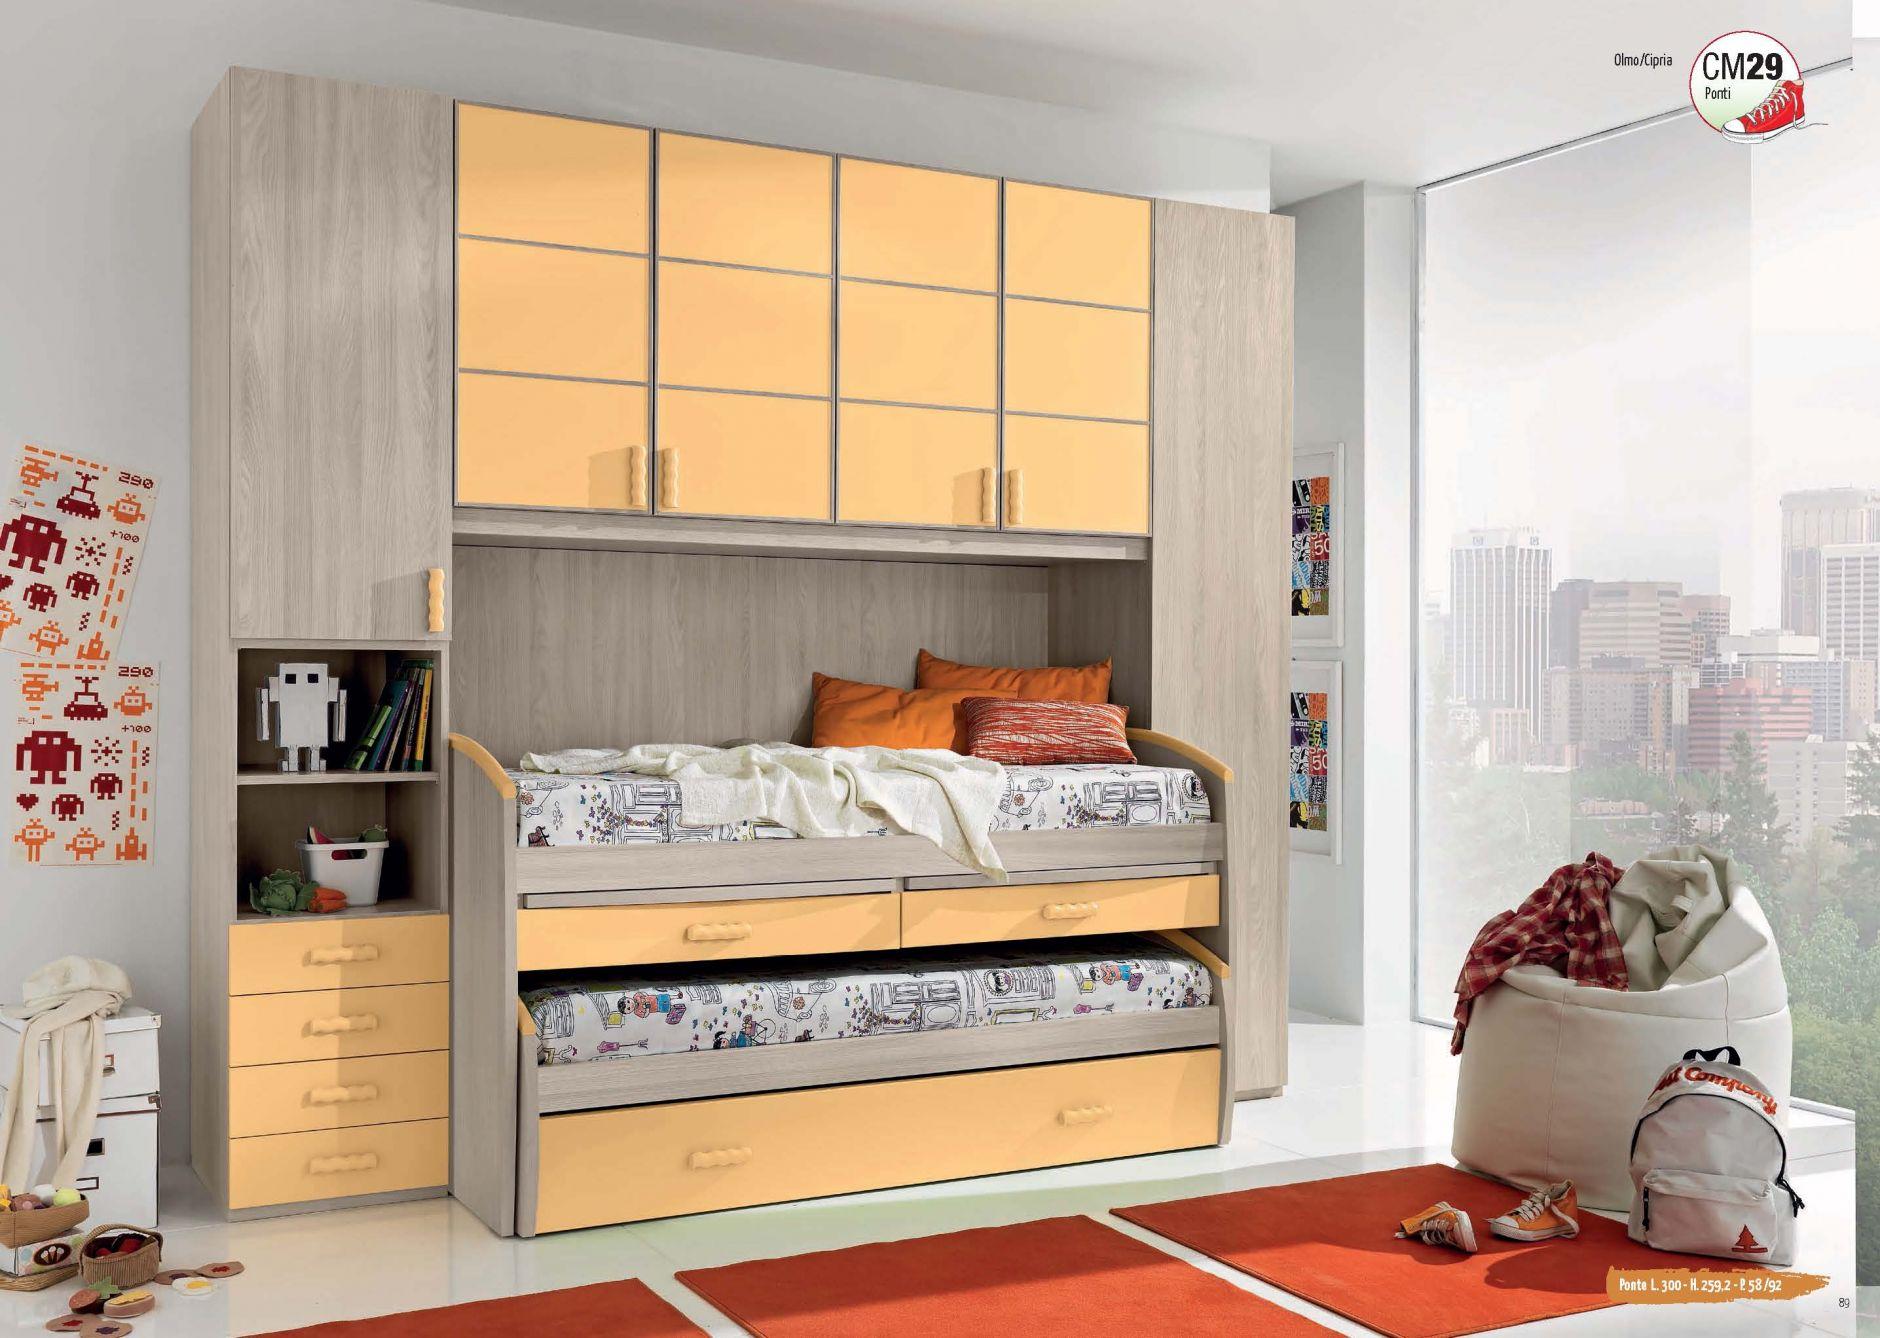 Muebles De Los Ni Os Muebles Giessegi Sm29 Composici N  # Giessegi Muebles Infantil